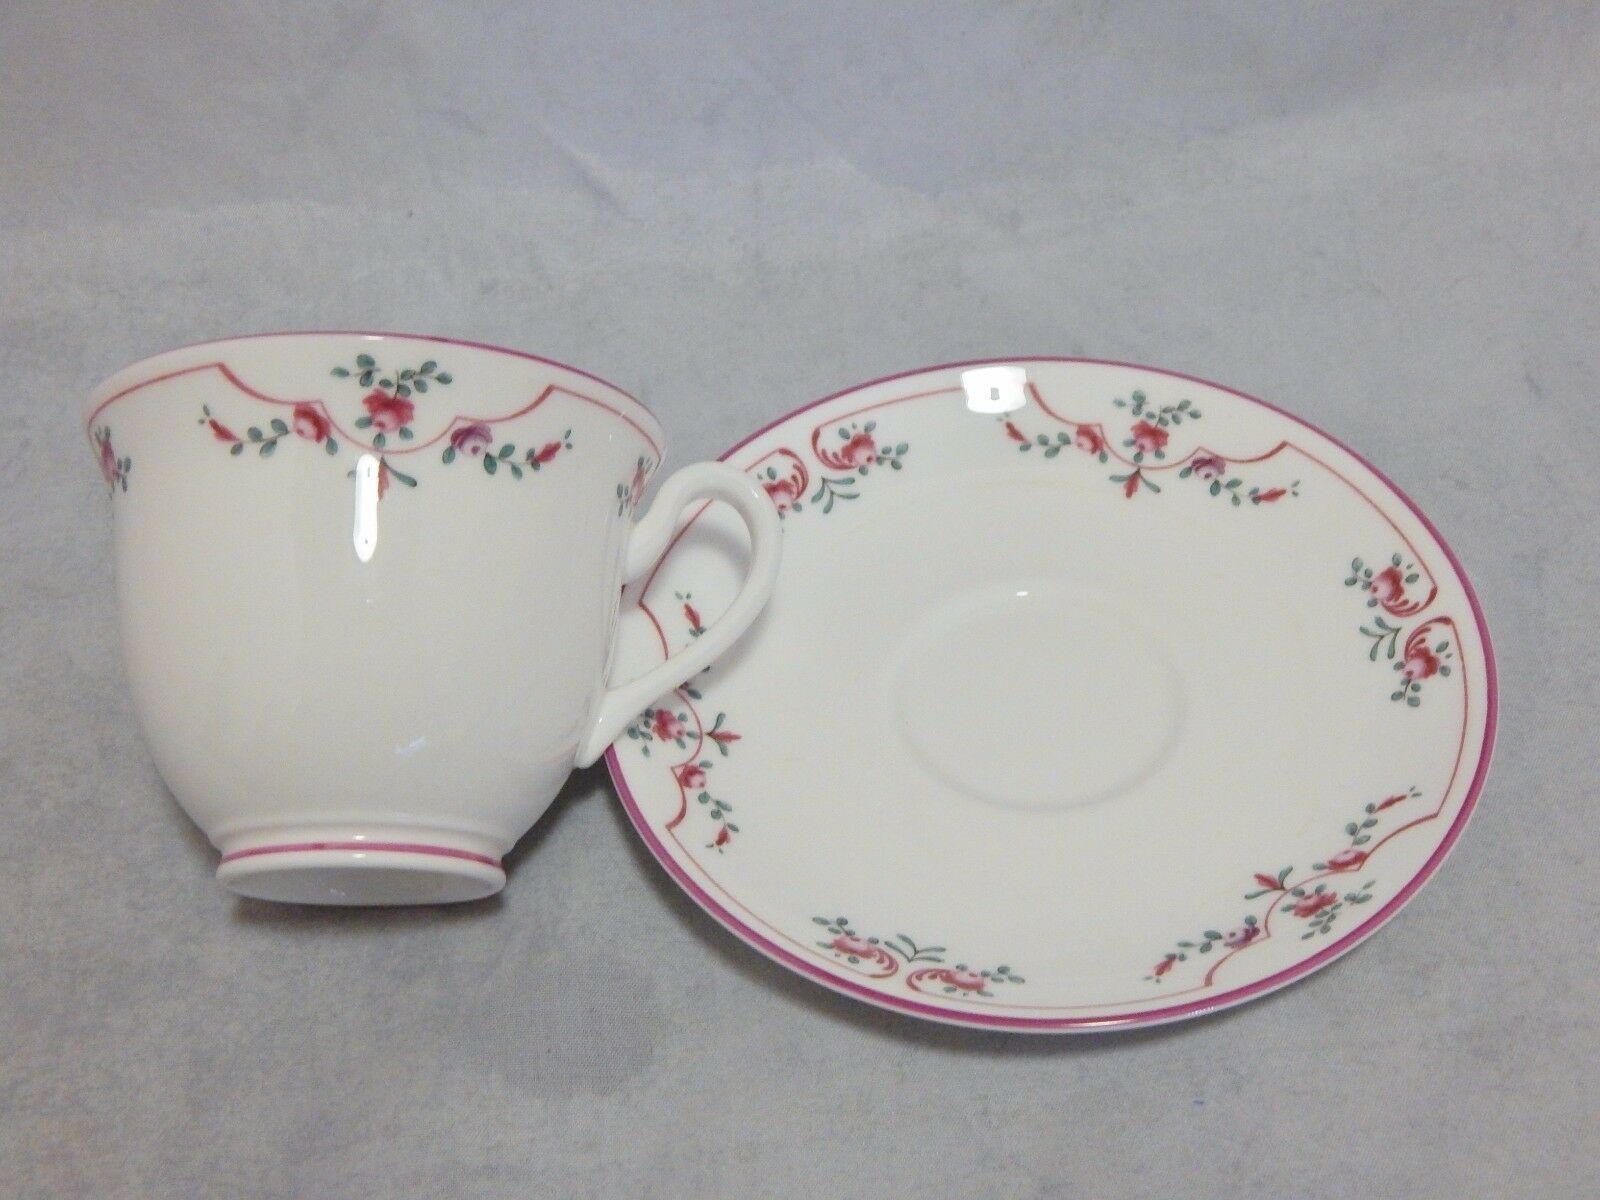 Royal Worcester Pink Petite Fleur Cup and Saucer Set